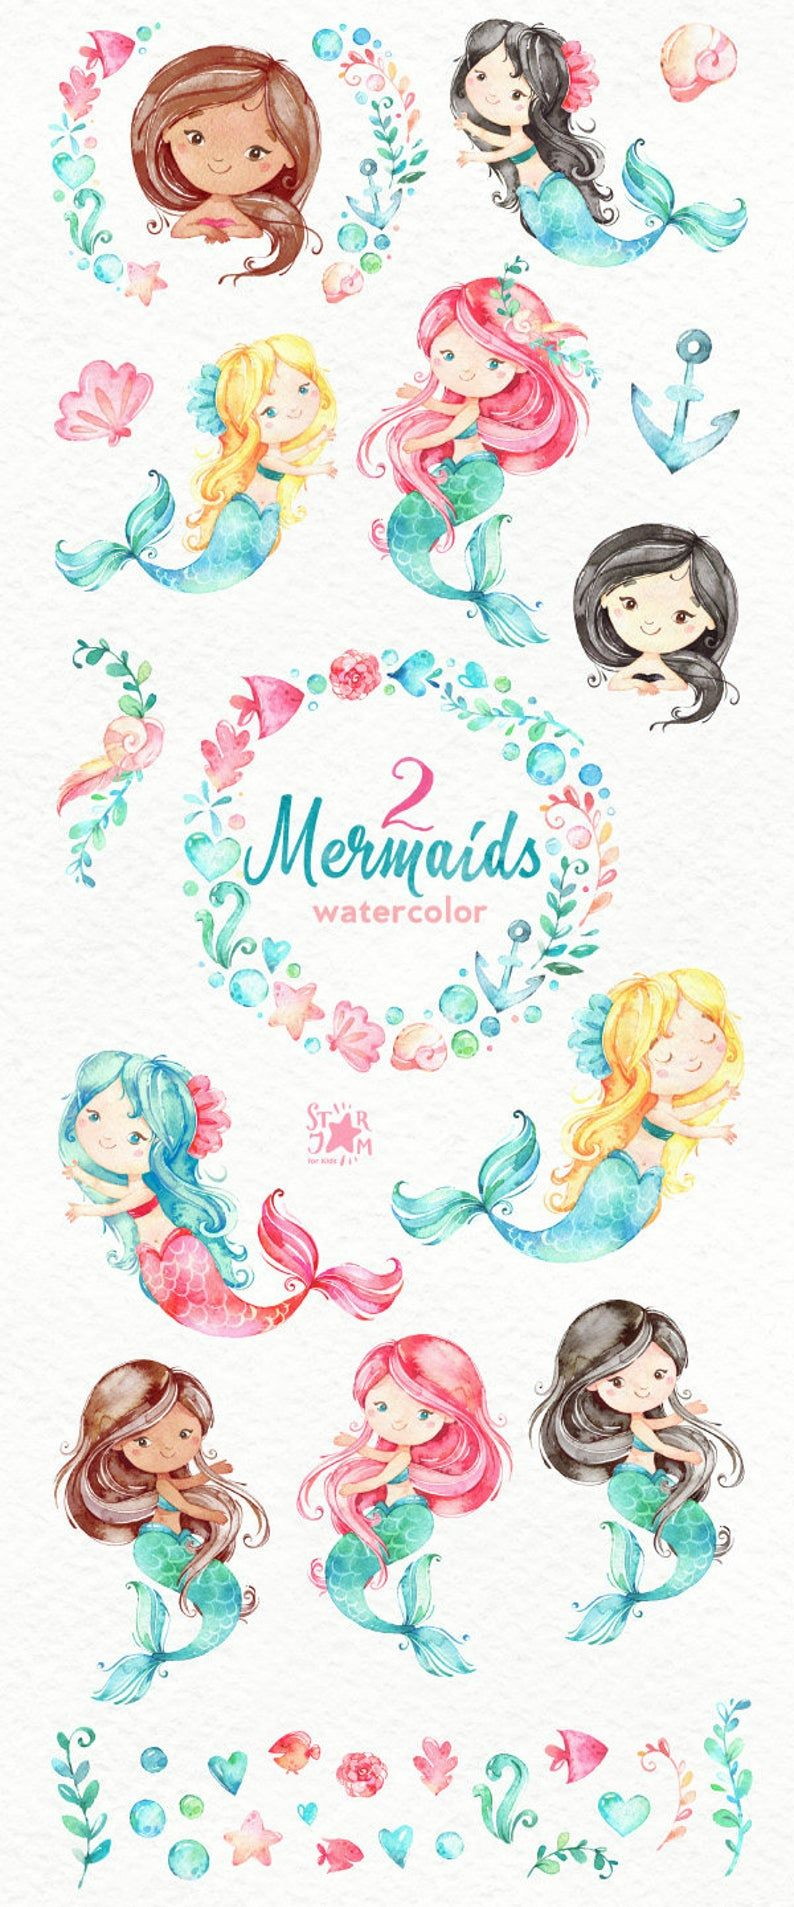 Meerjungfrauen 2 Aquarell Clipart Meer Madchen Magie Marchen